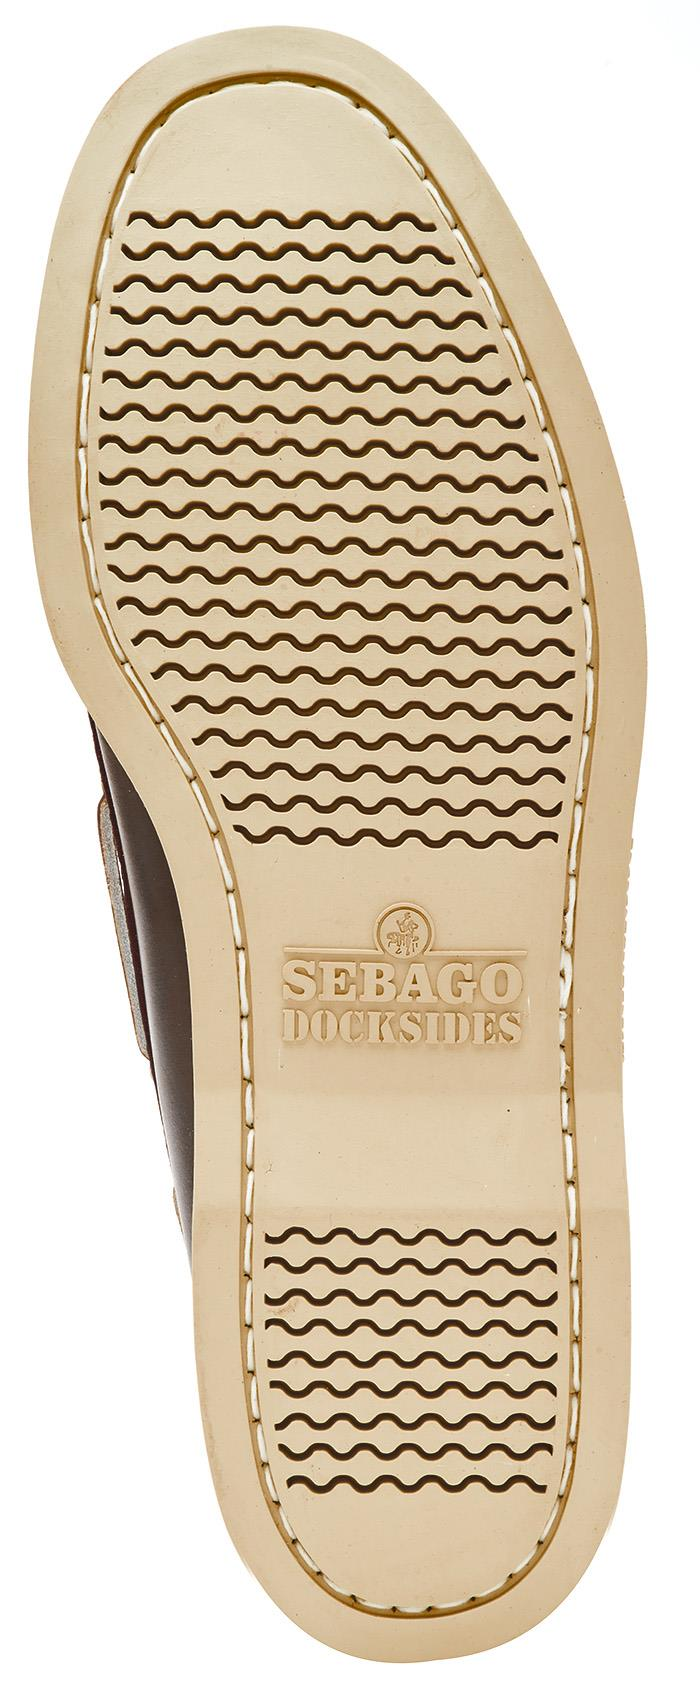 Sebago-Docksides-NBK-Suede-Boat-Deck-Shoes-in-Navy-Blue-amp-Coral-amp-Dark-Brown thumbnail 9